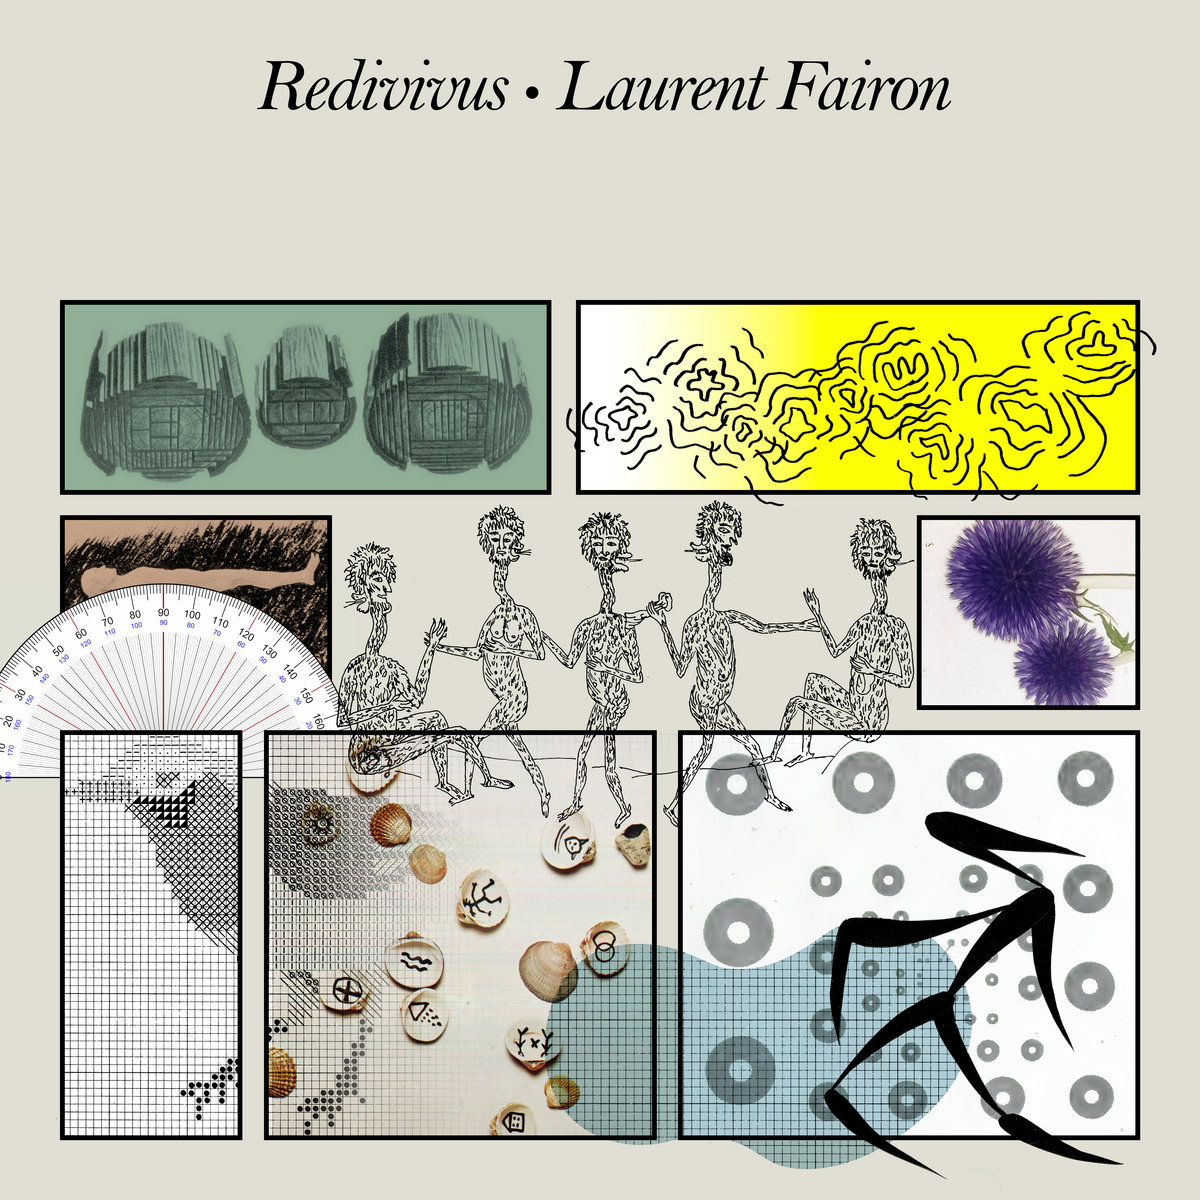 Laurent Fairon – Redivivus